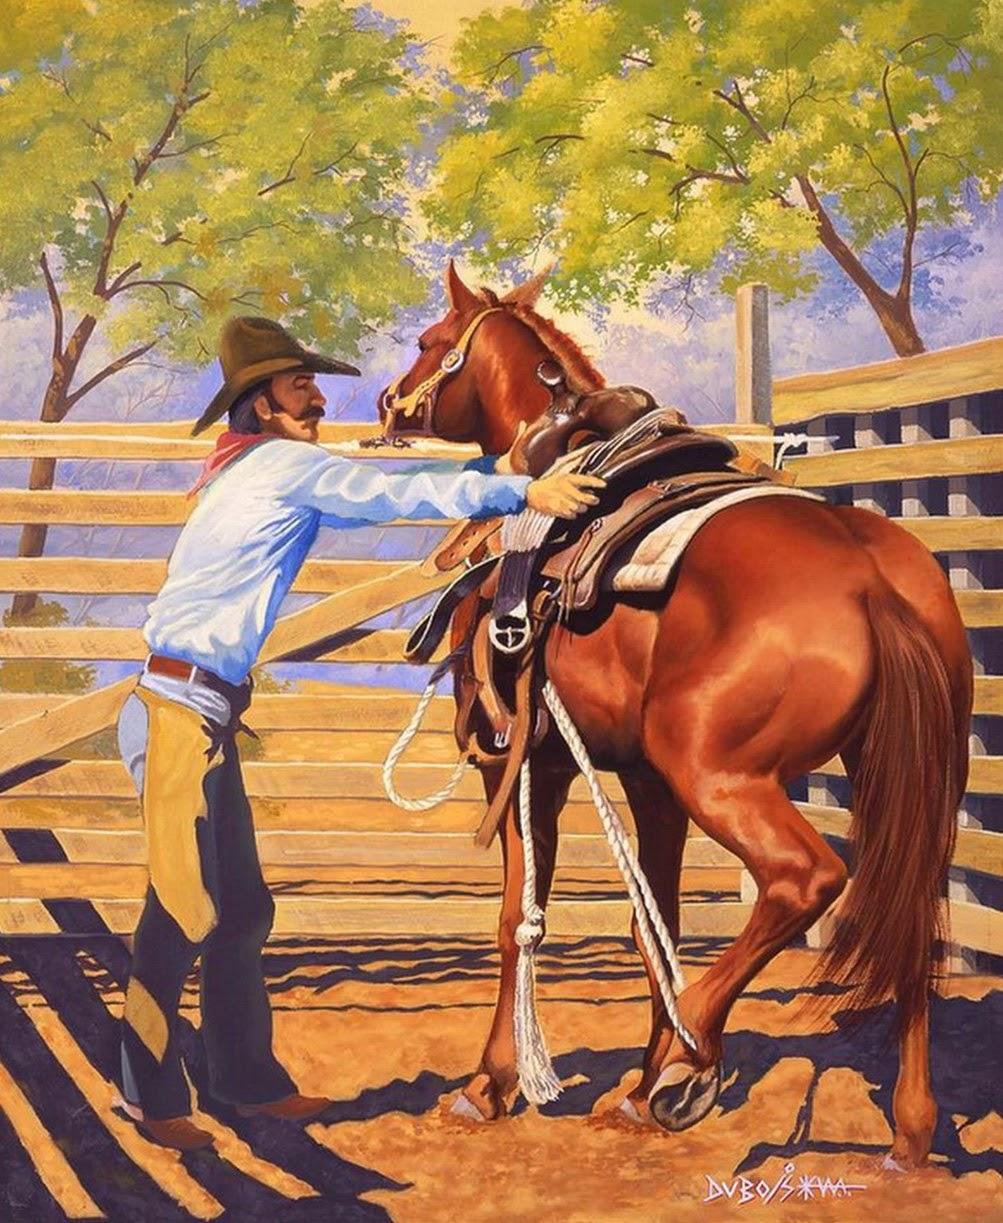 caballos-galopando-cuadros-al-oleo